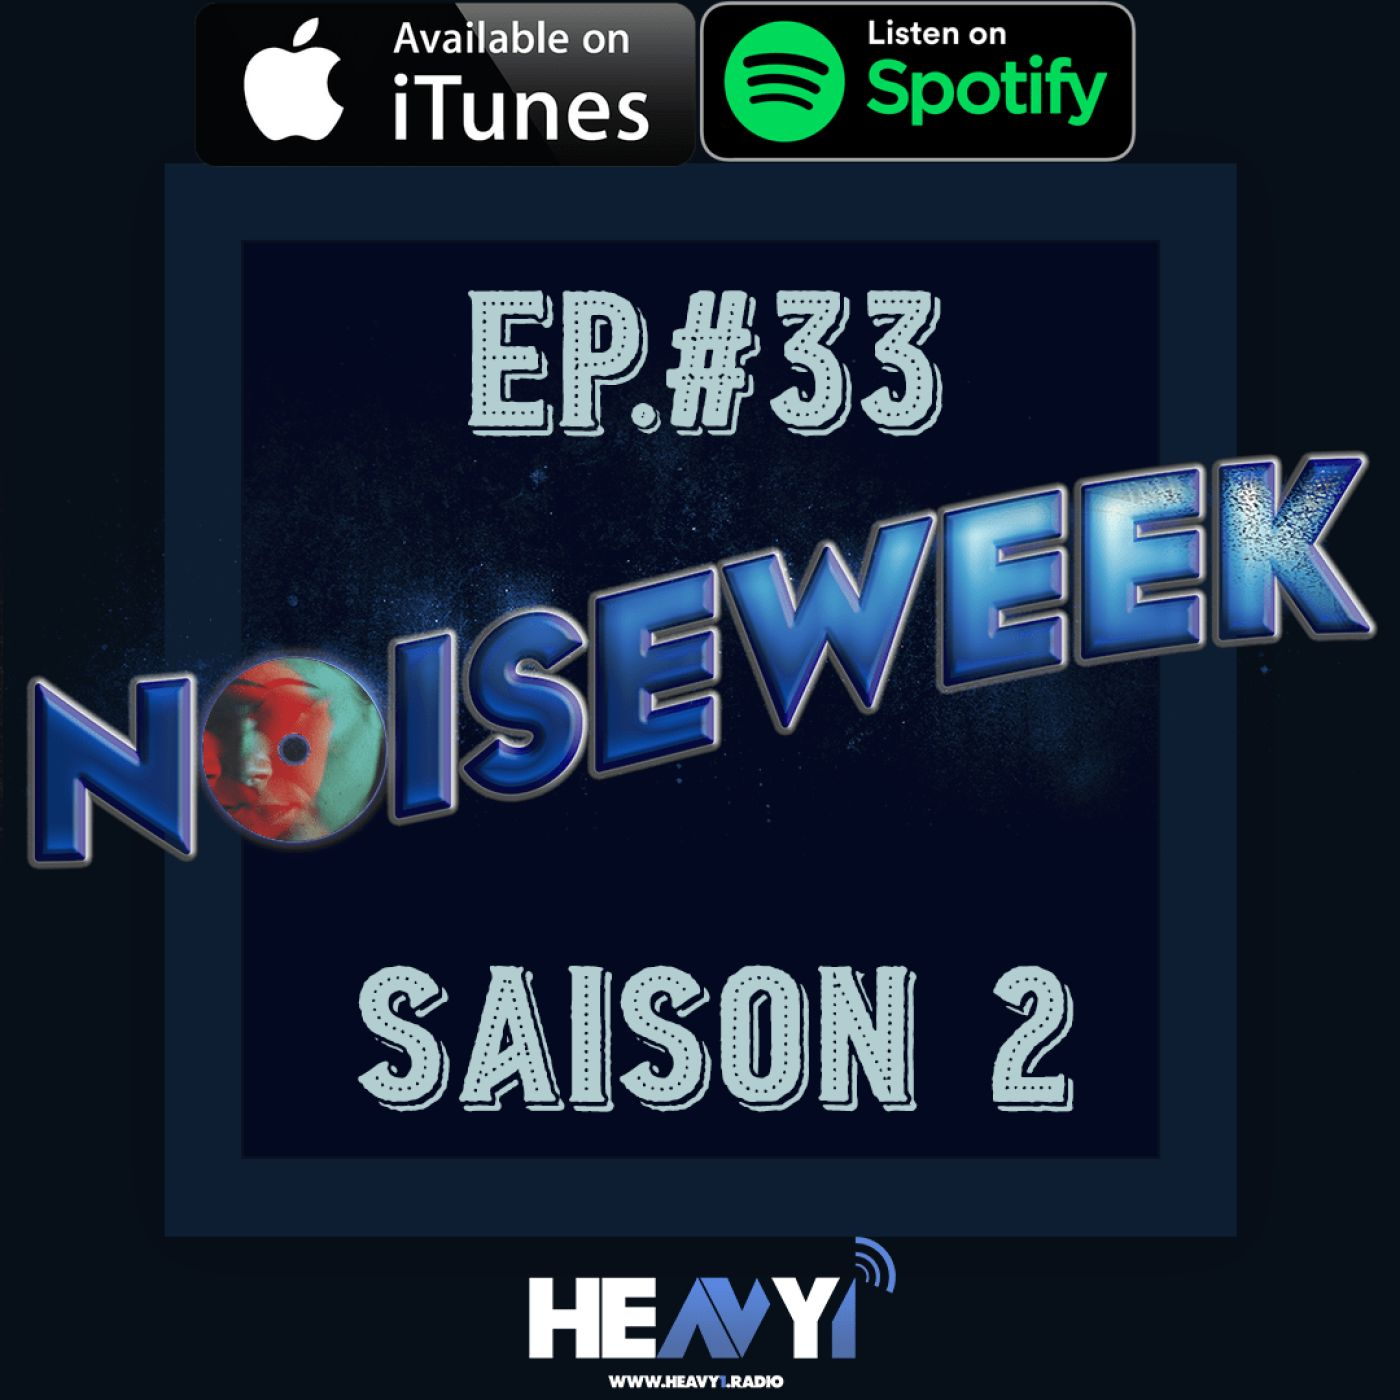 Noiseweek #33 Saison 2